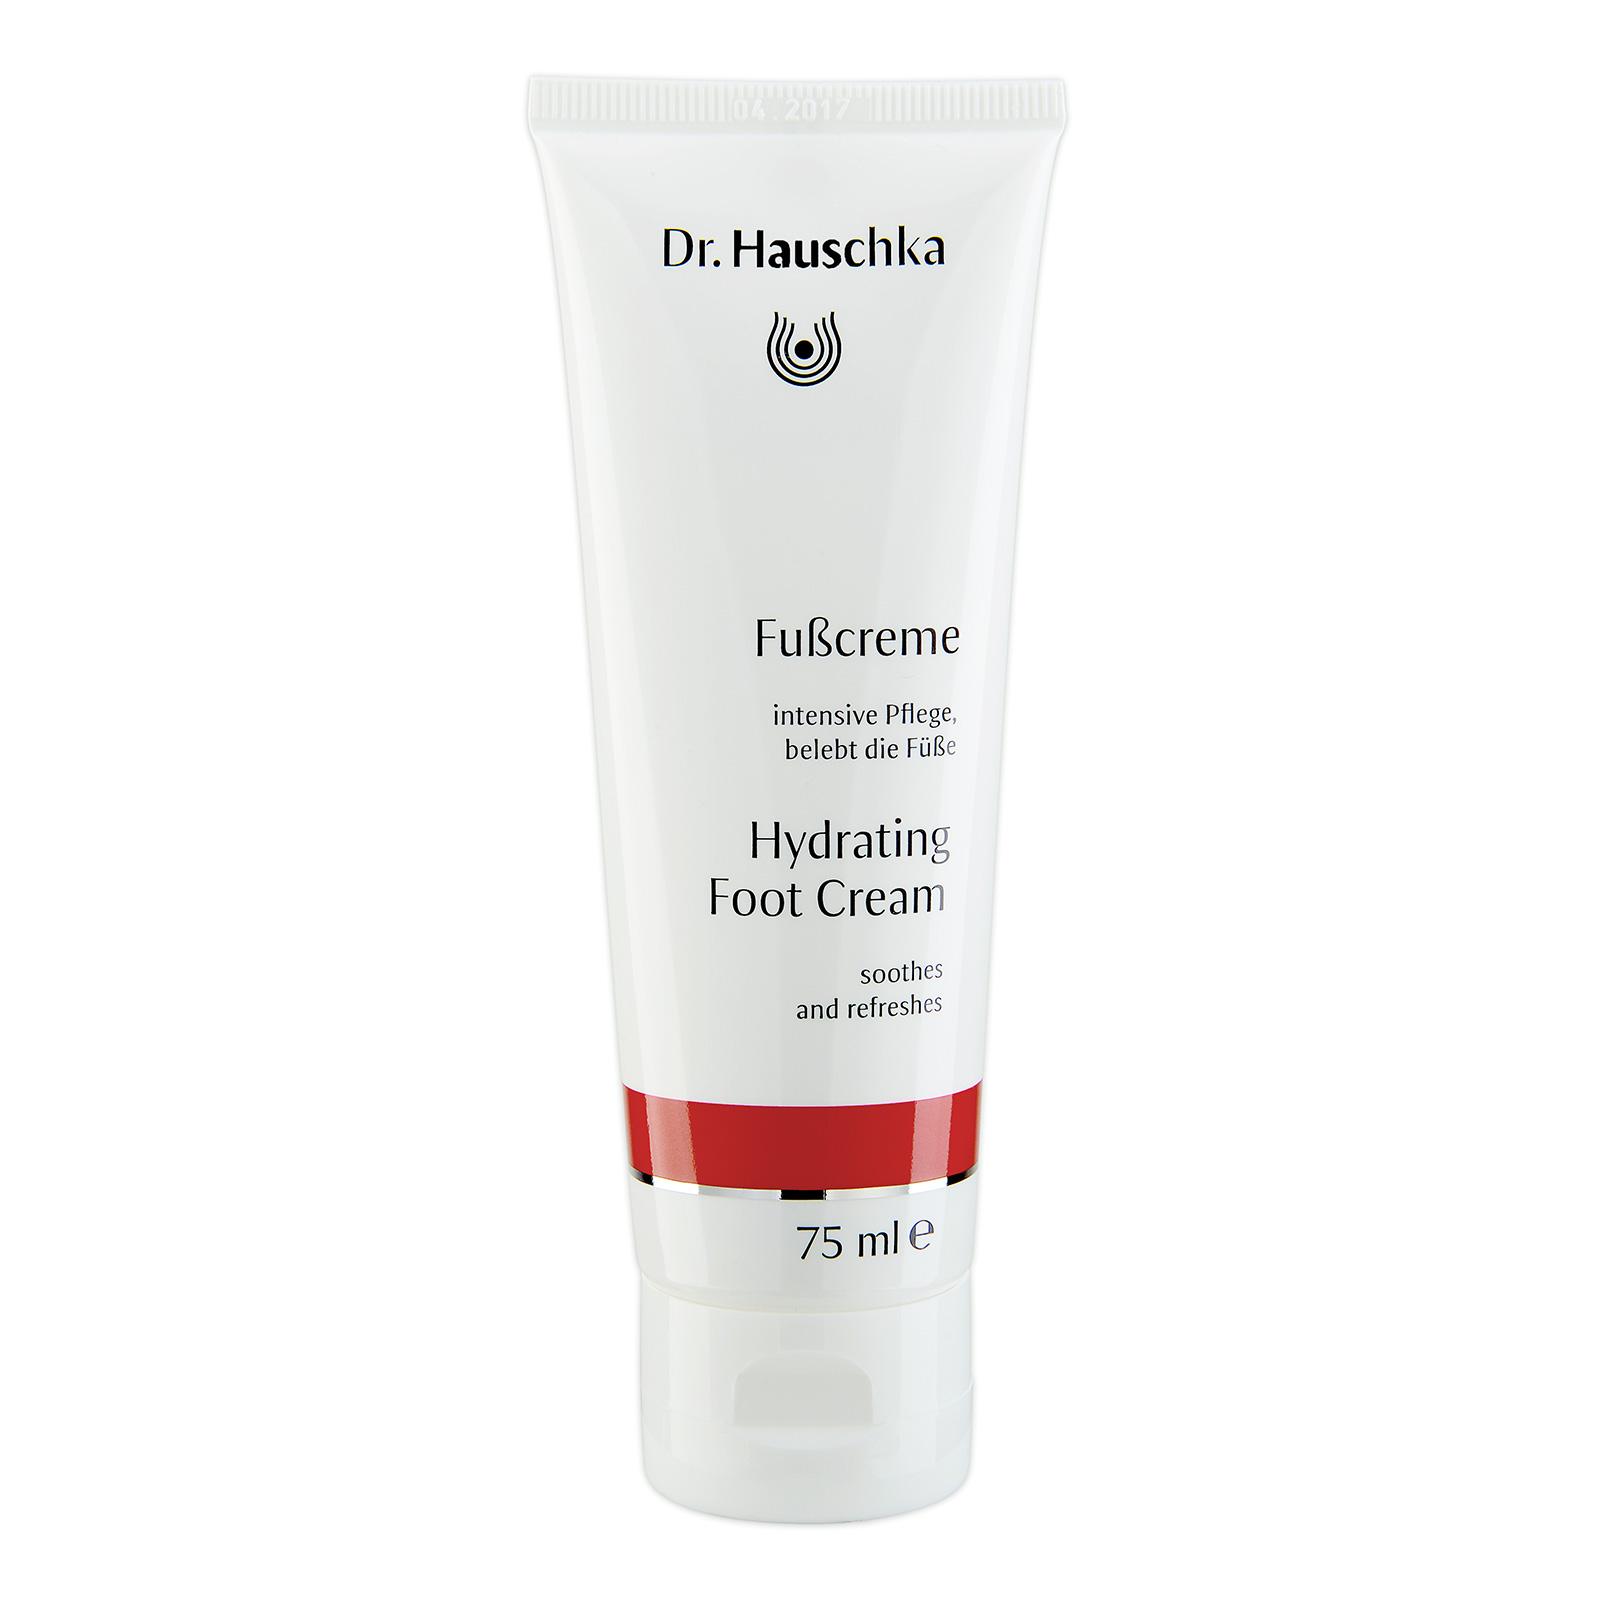 Dr. Hauschka  Hydrating Foot Cream 75ml,